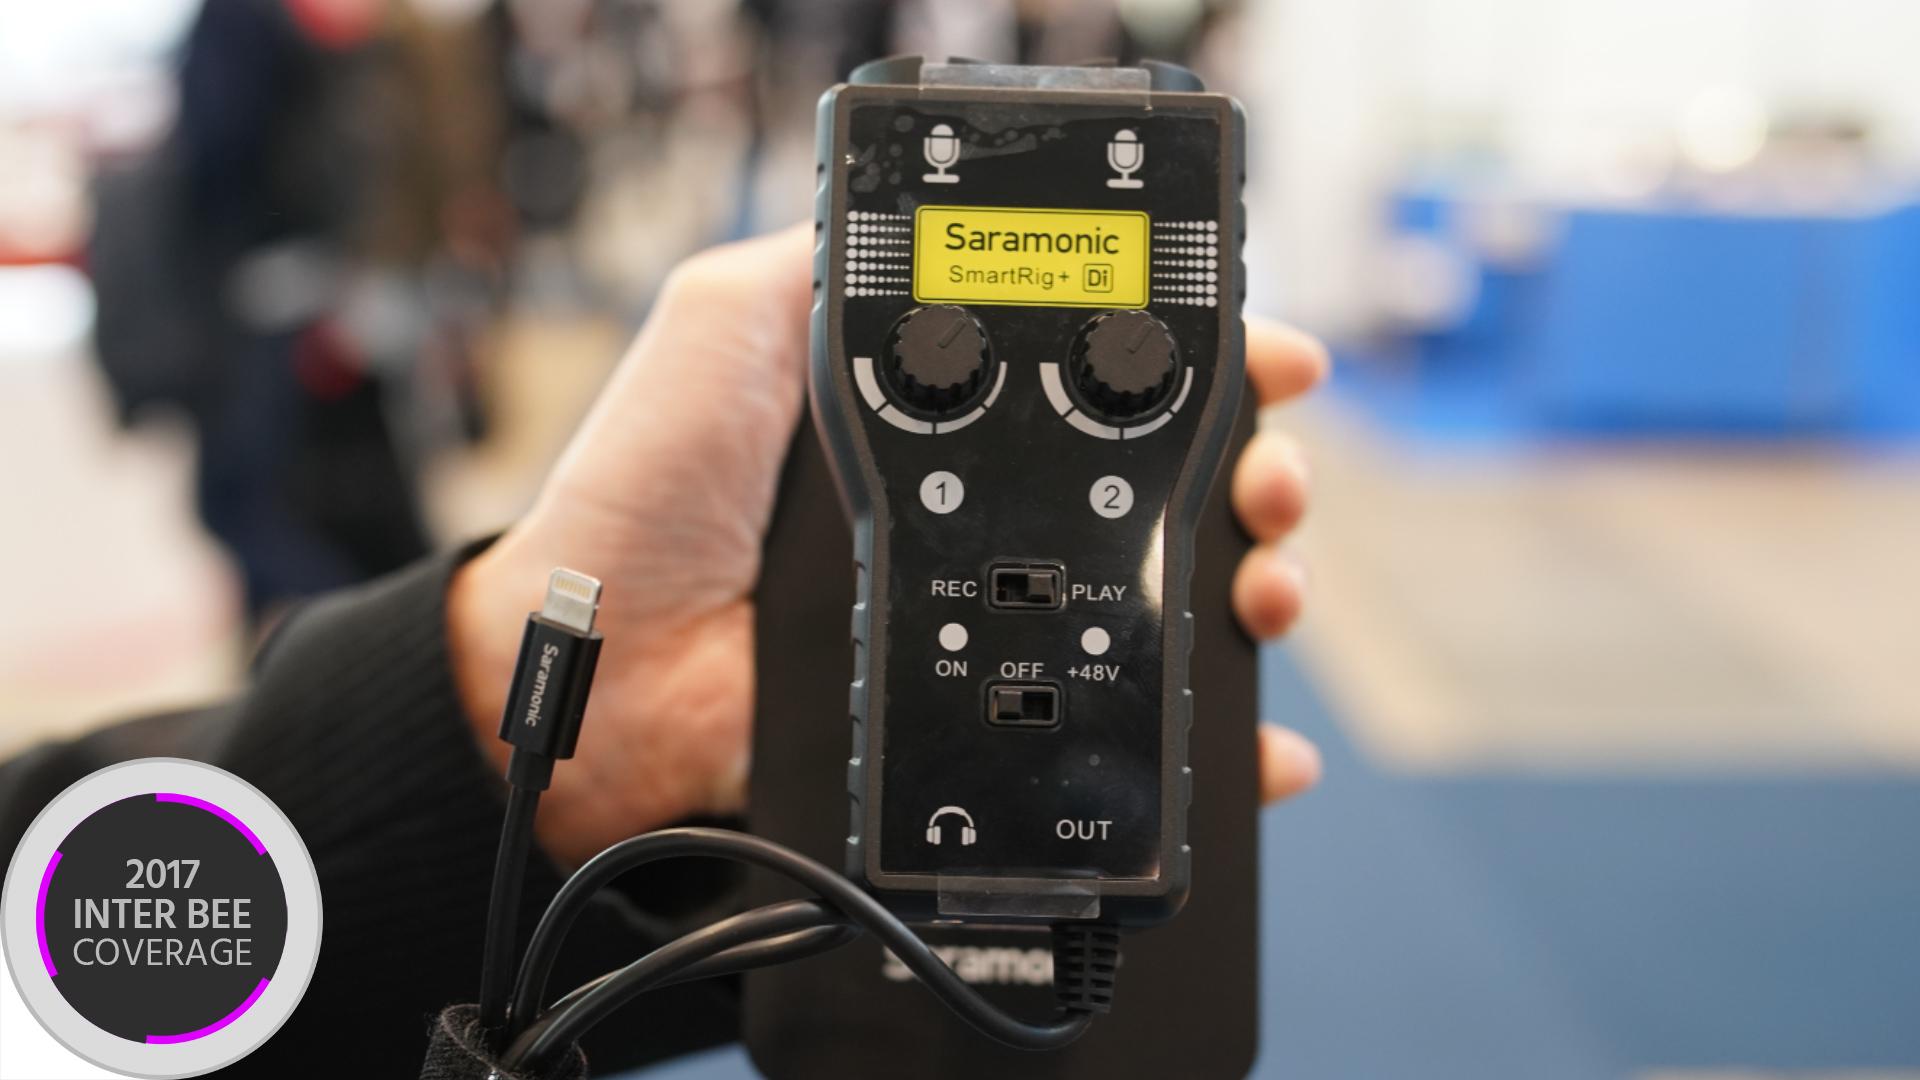 SaramonicがSmartRig+ DiをiPhone X用に発表